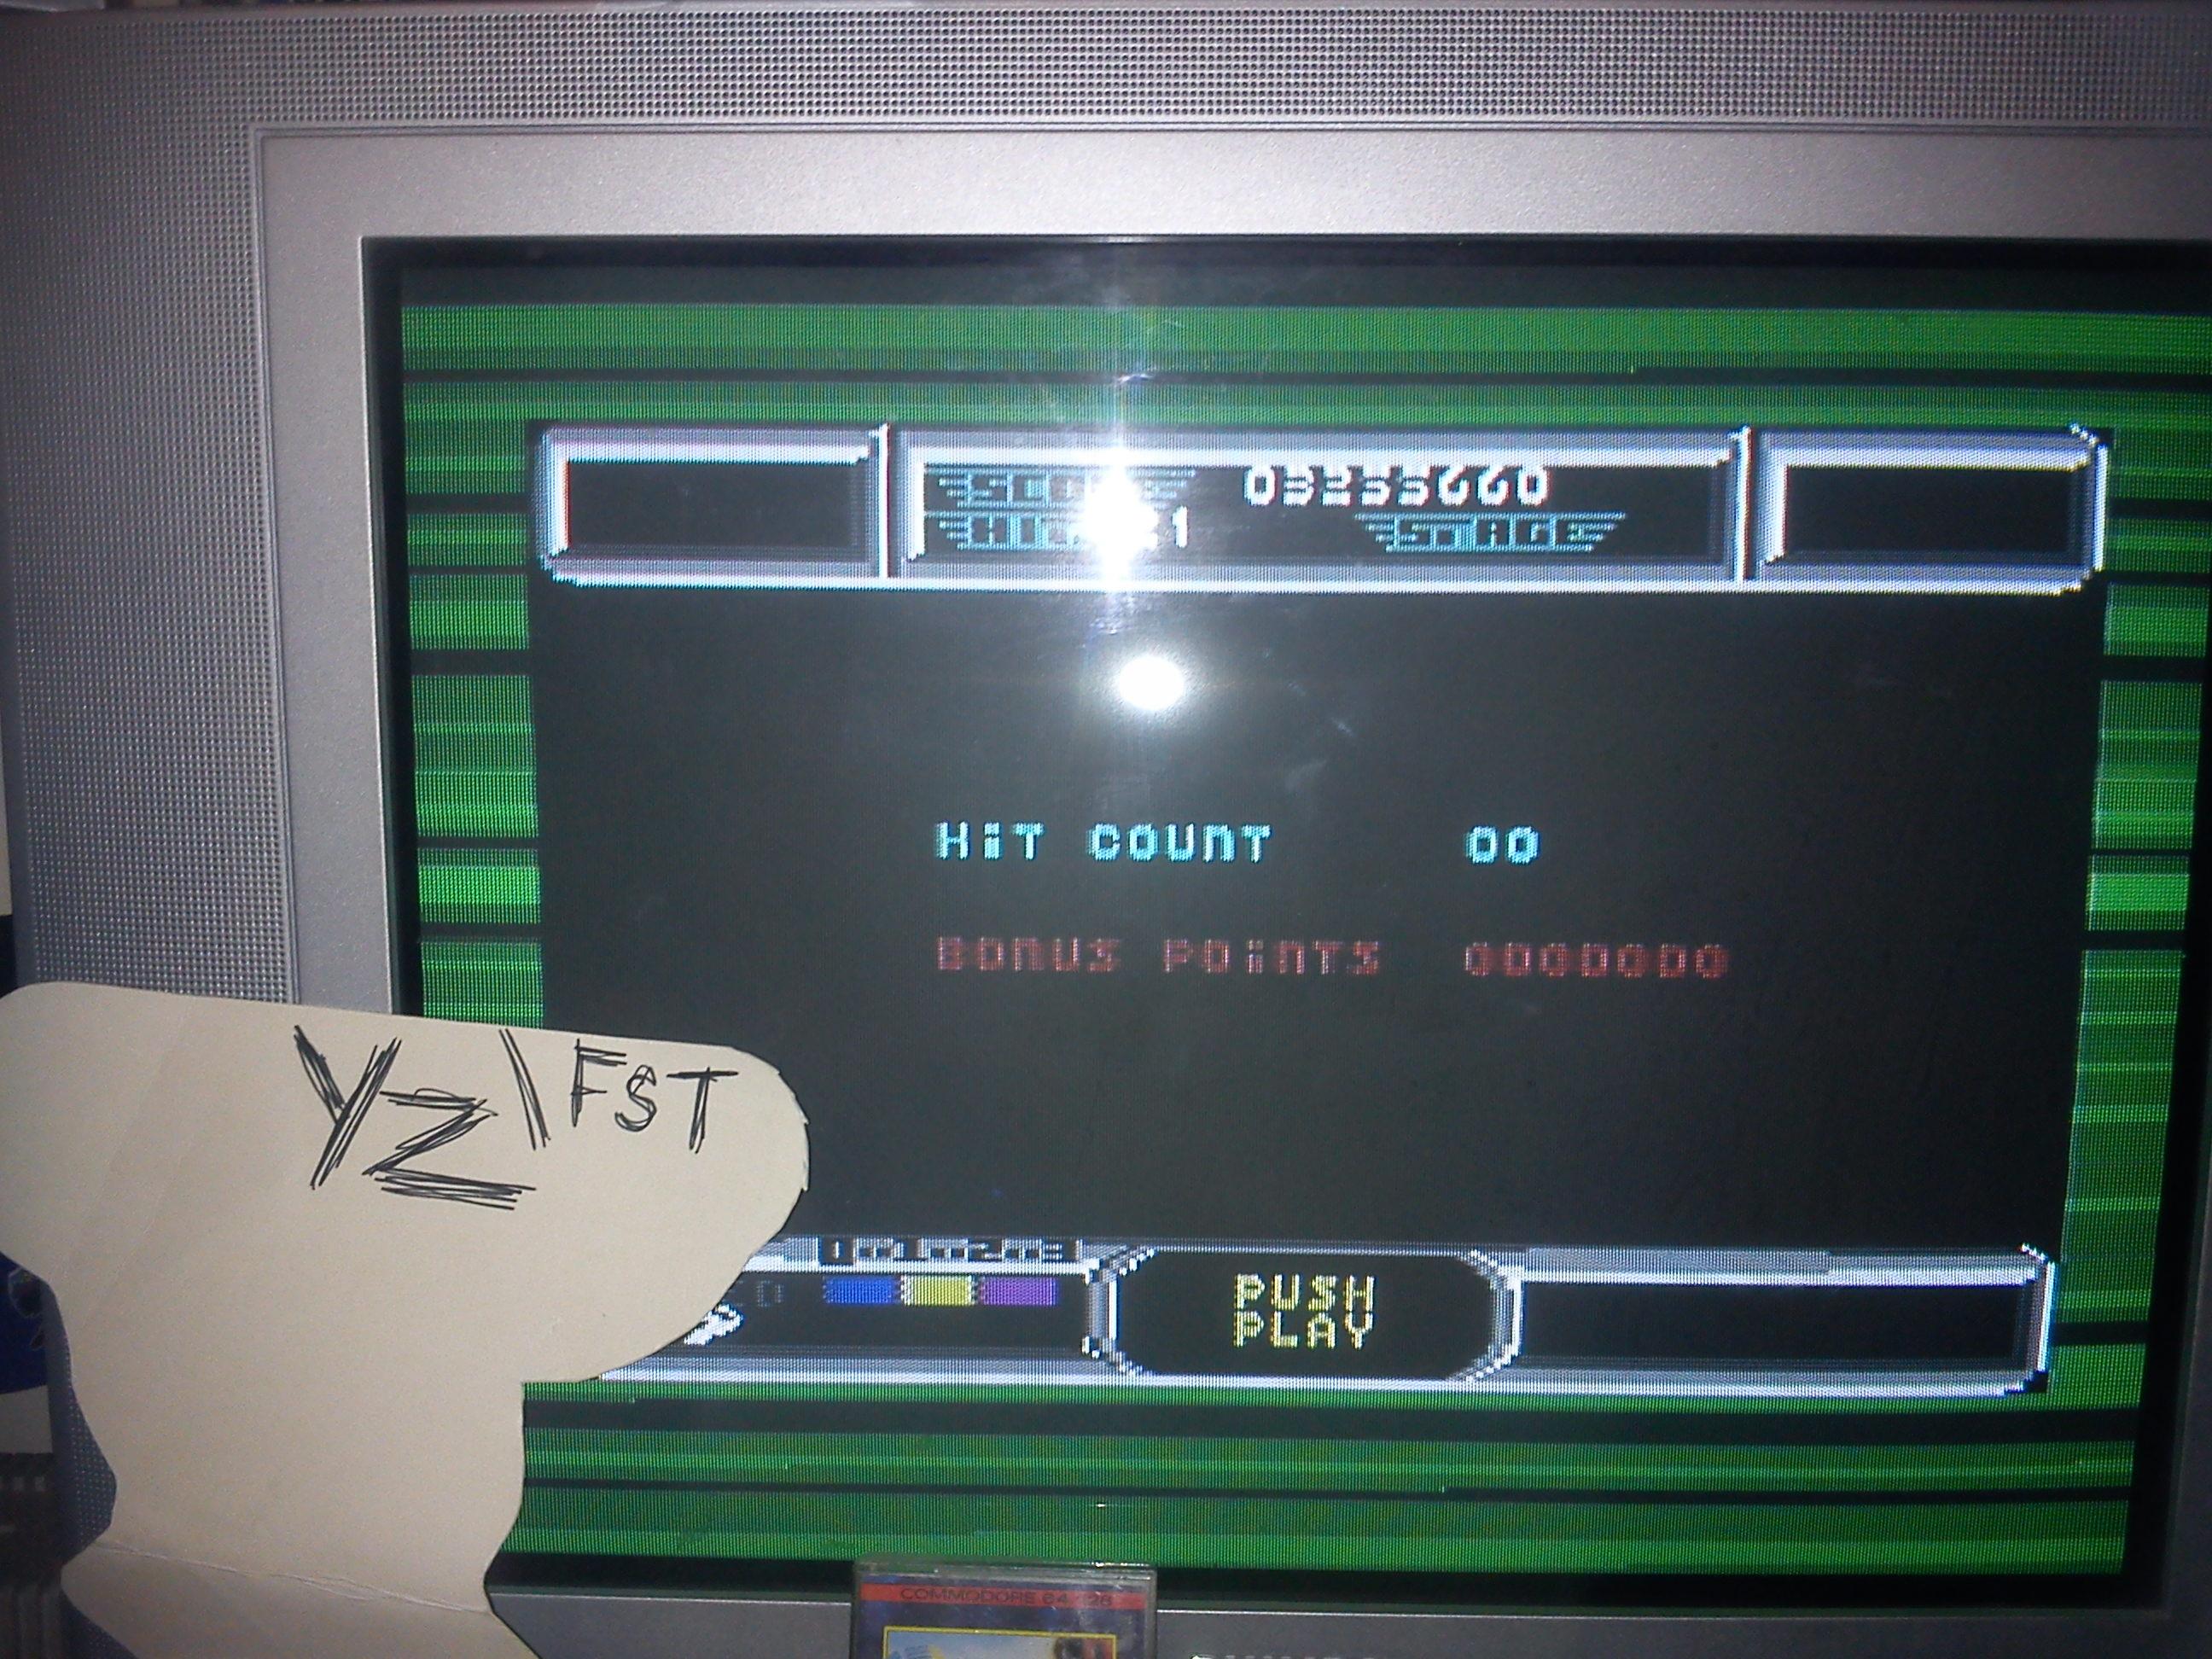 Fr0st: After Burner [UK/Activision] (Commodore 64) 3,255,660 points on 2014-06-03 16:58:09